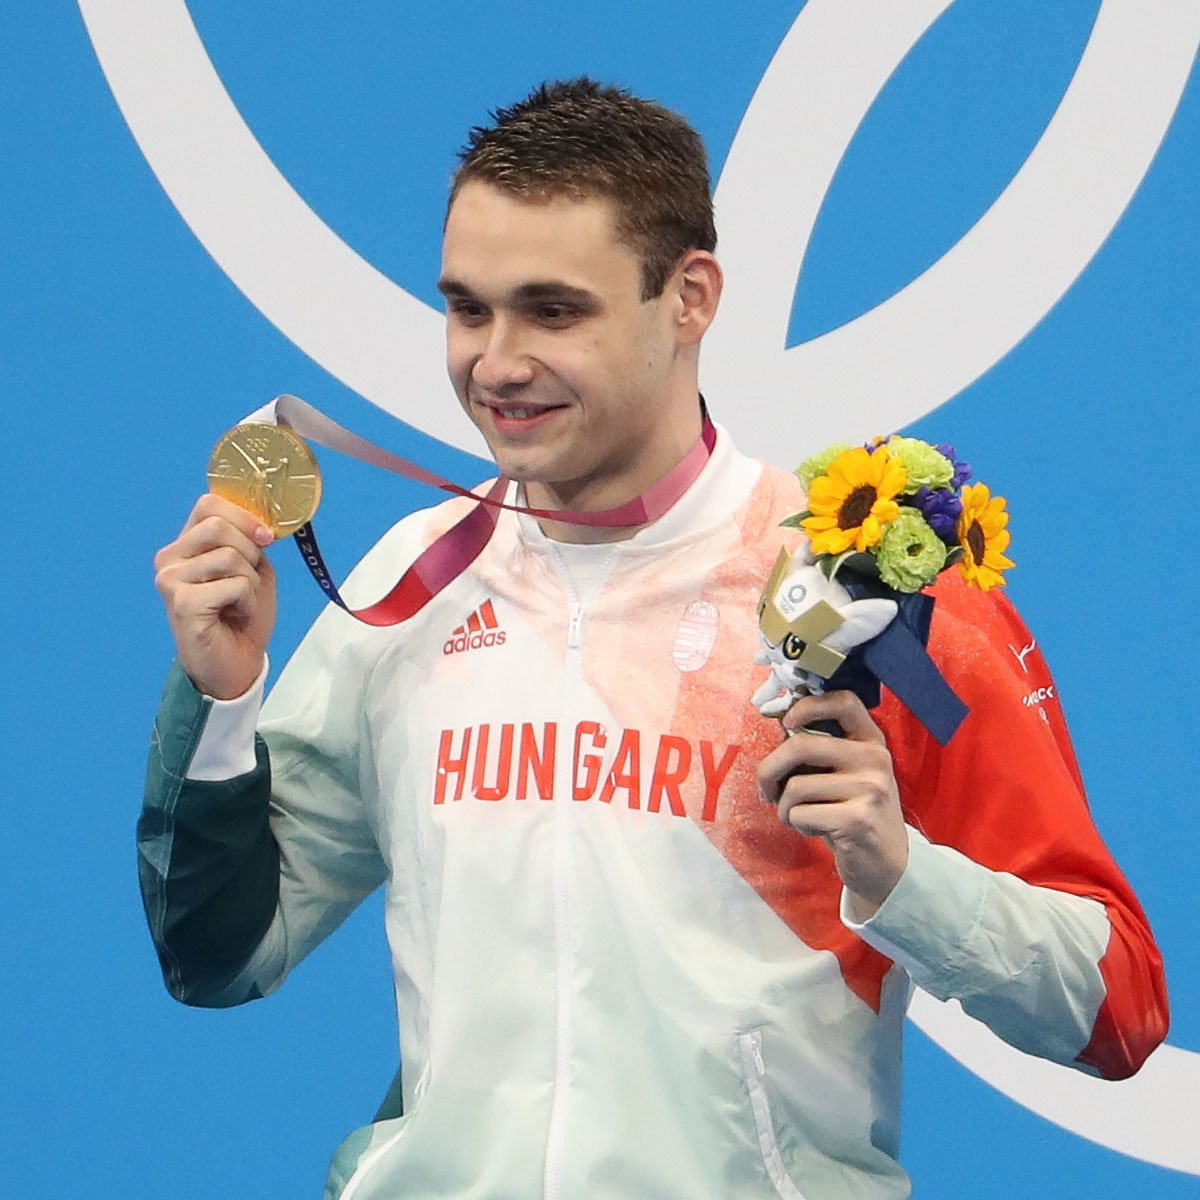 Olympian Kristof Milak Says Ripped Swim Trunks Cost Him World Record